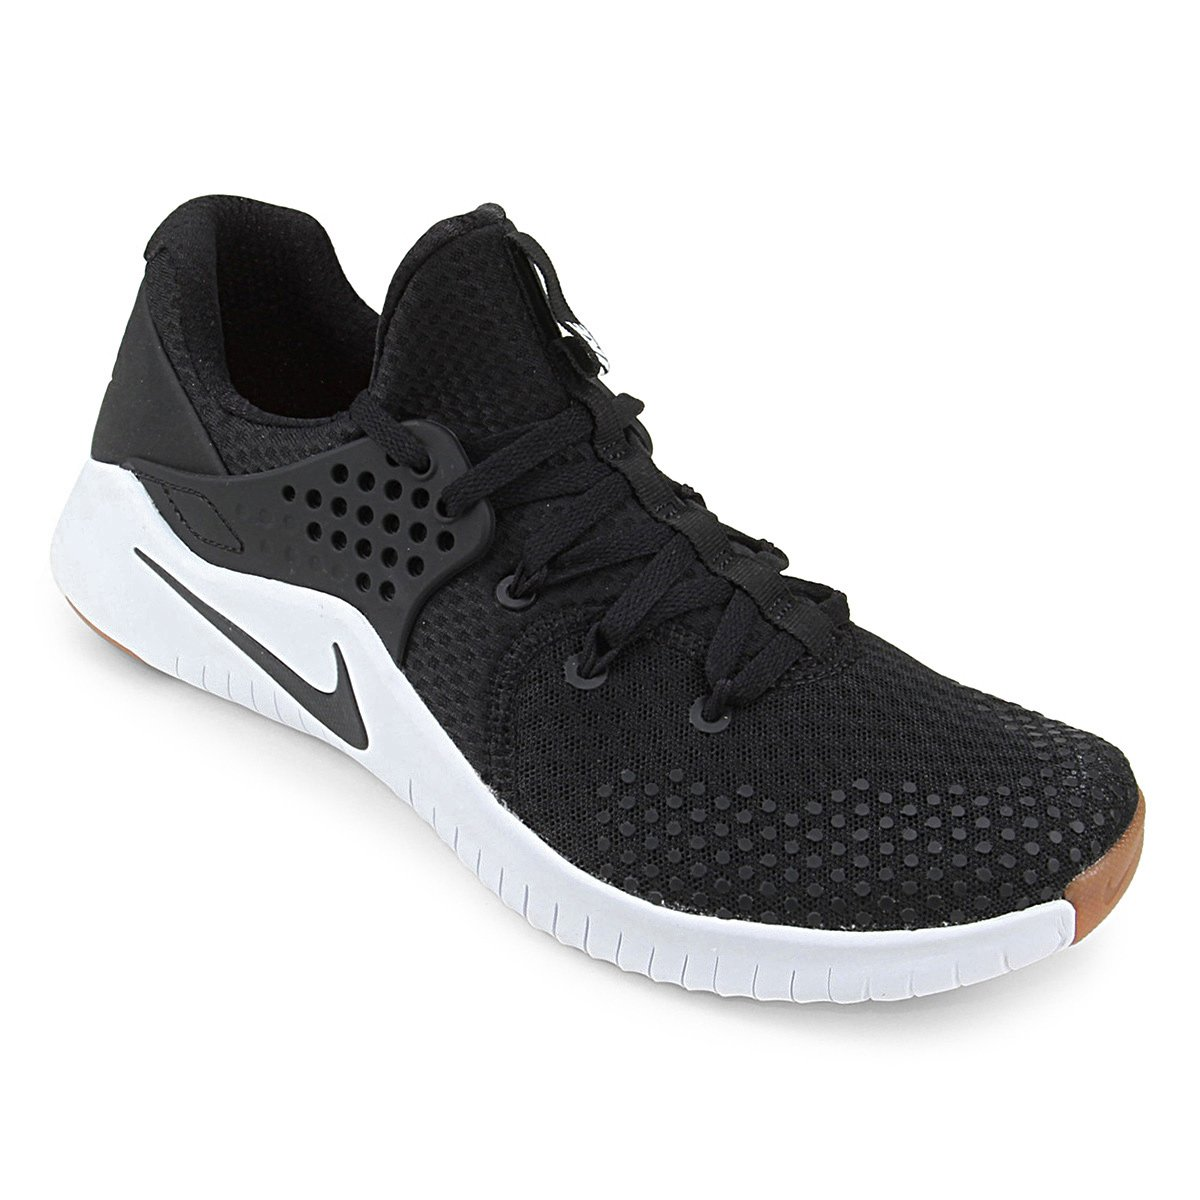 b4bbb28416 Tênis Nike Free TR V8 Masculino - Preto e Branco - Compre Agora ...